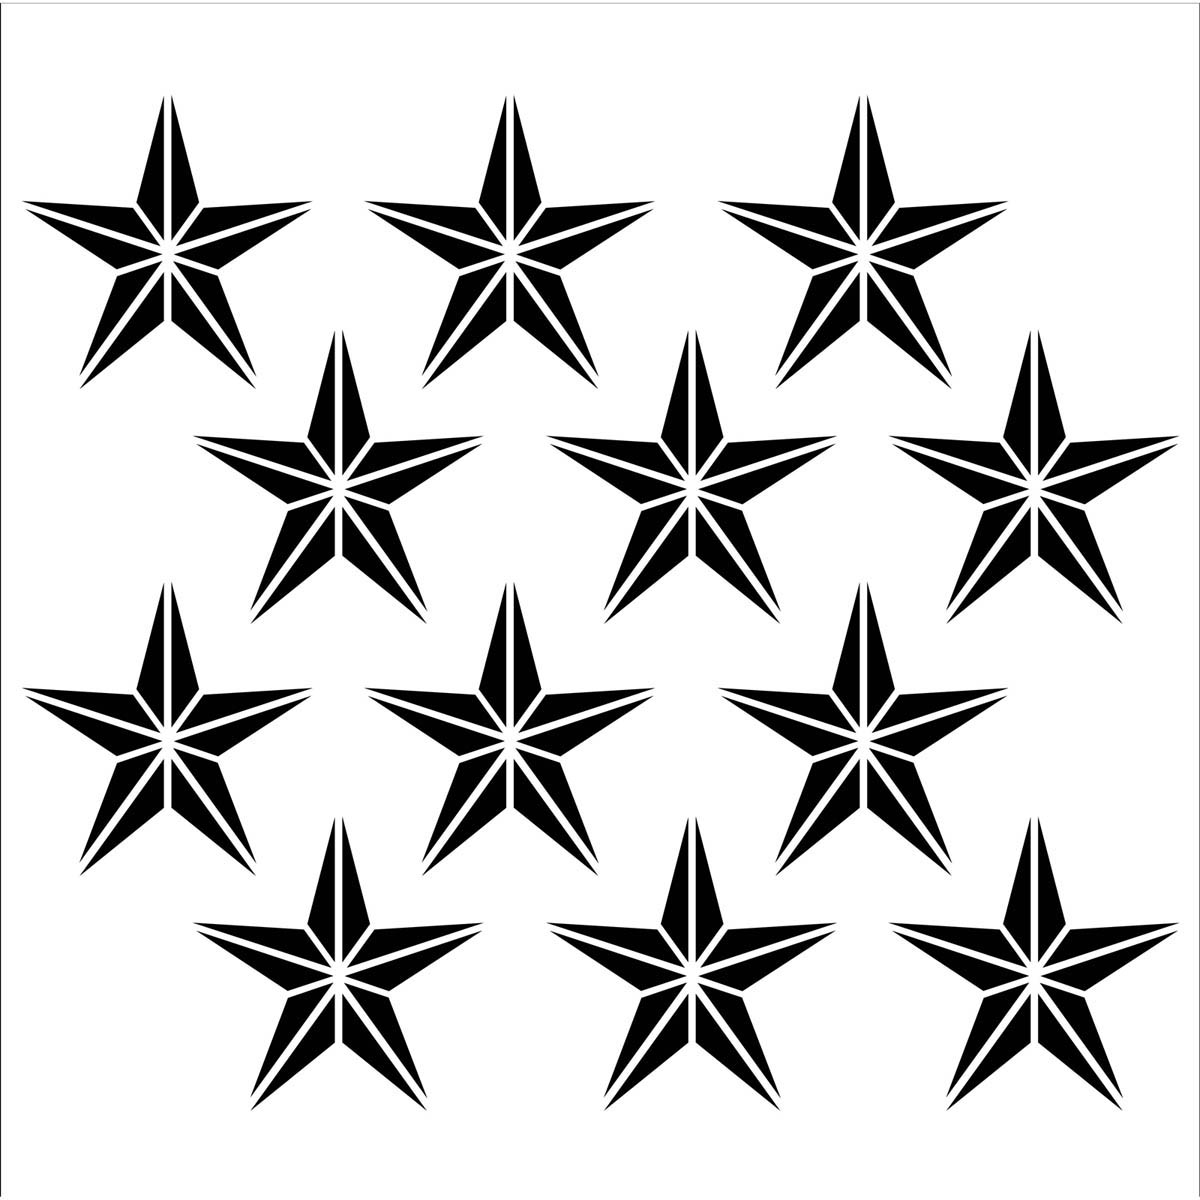 FolkArt ® Painting Stencils - Large - Stars Forever